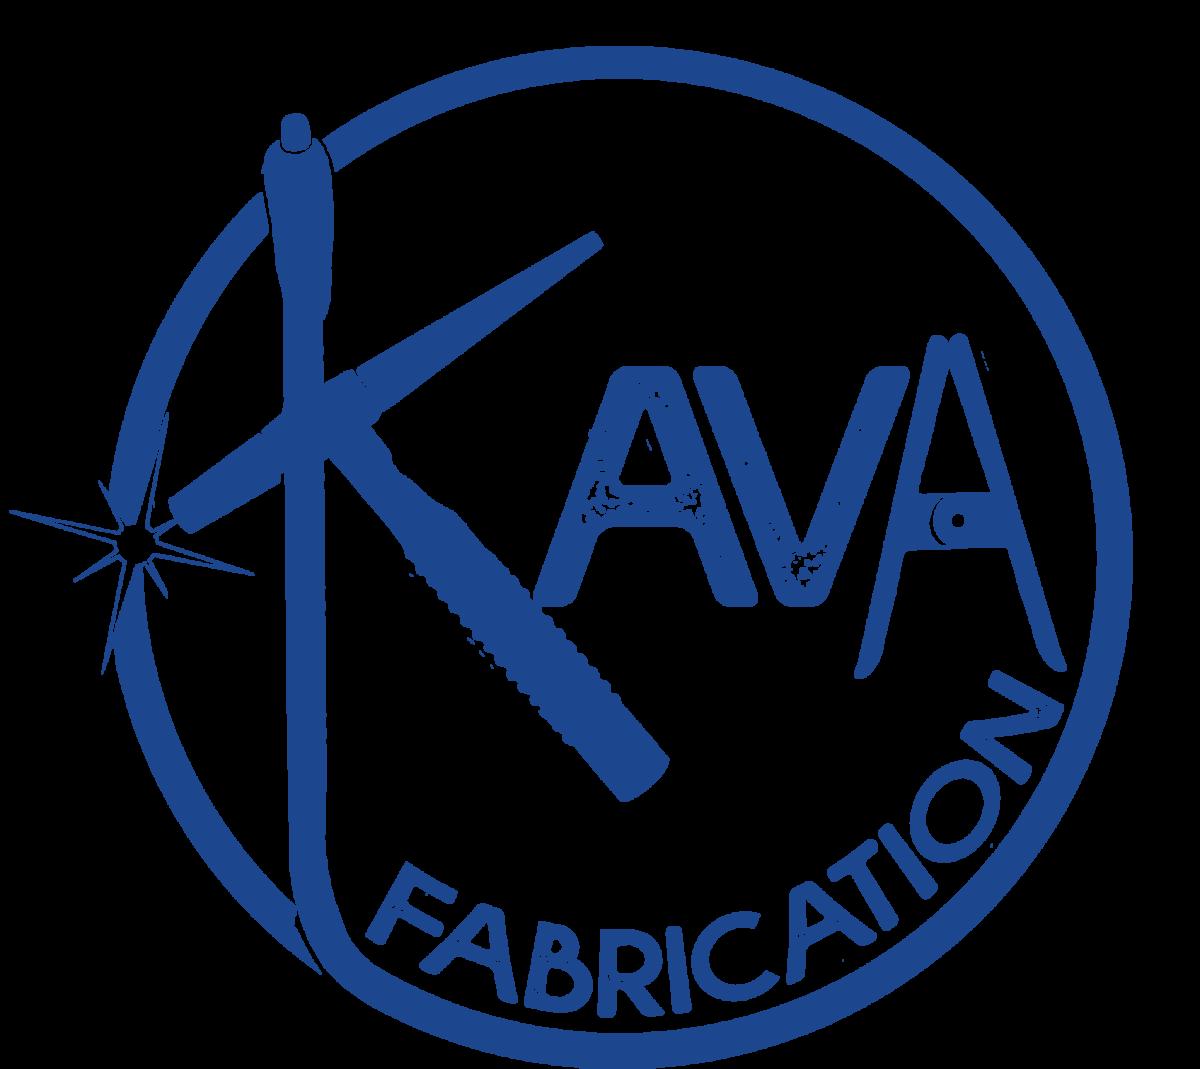 Kava Fabrication